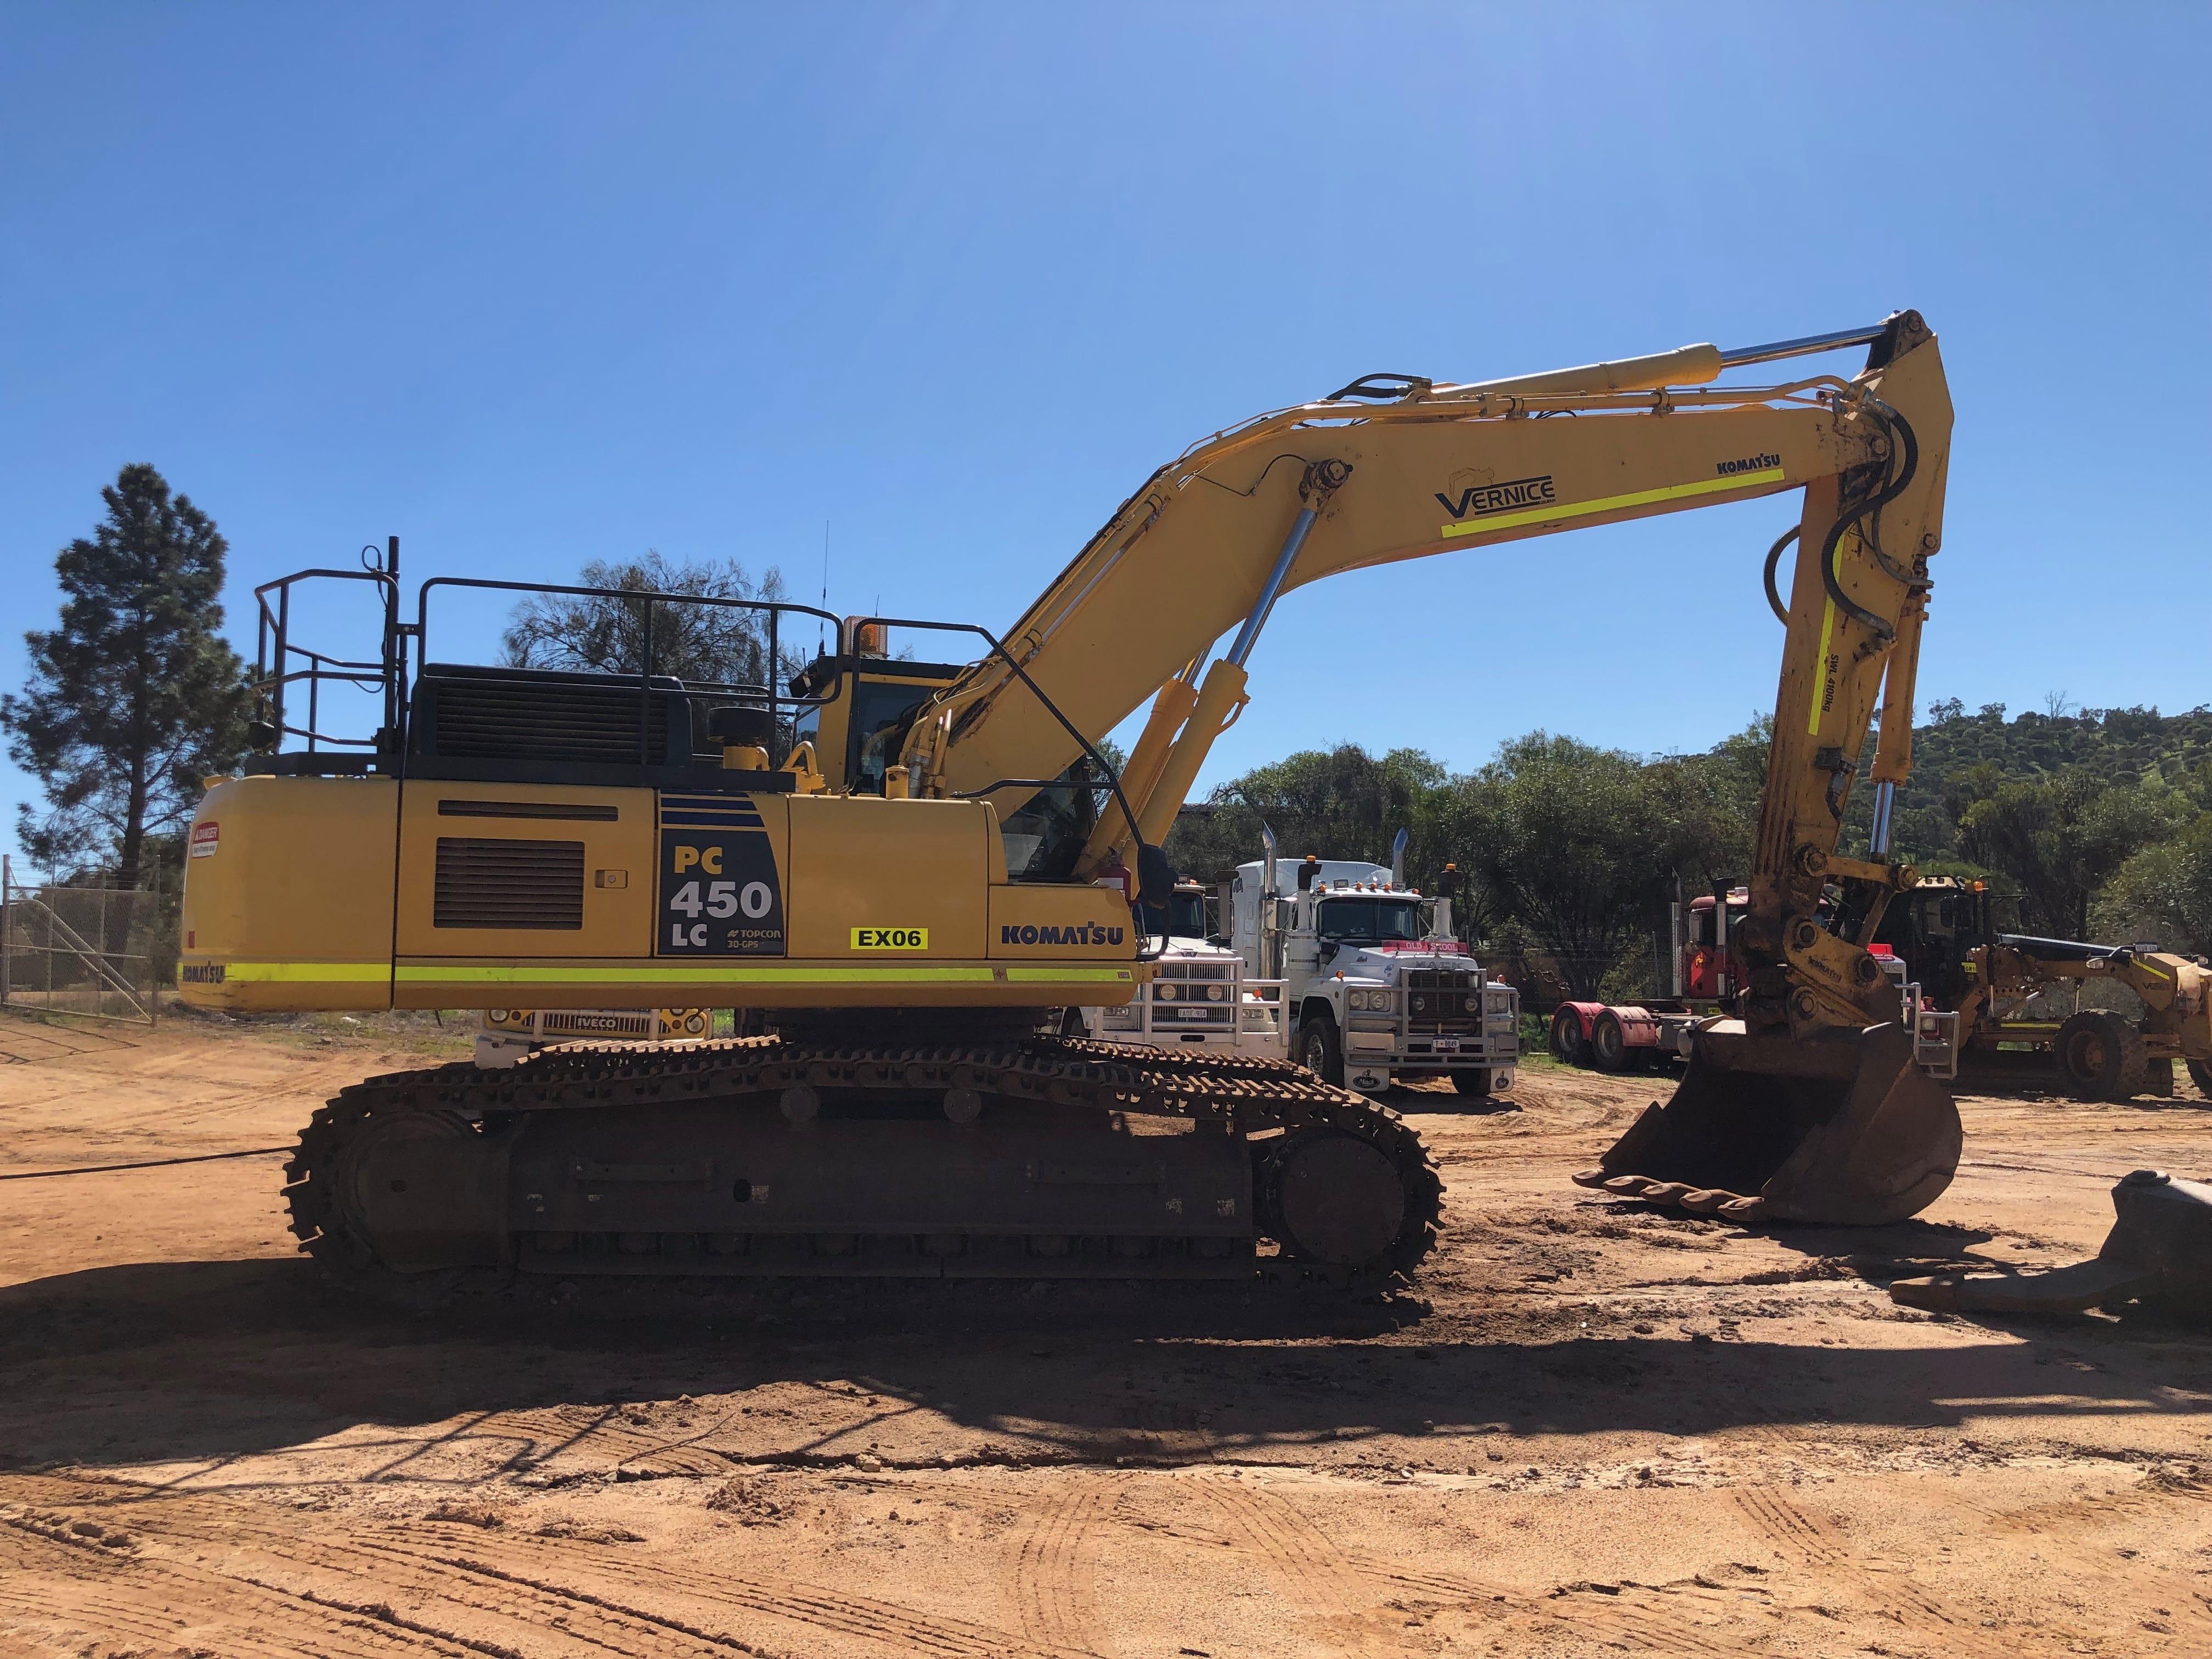 45 t excavator hire vernice western australia